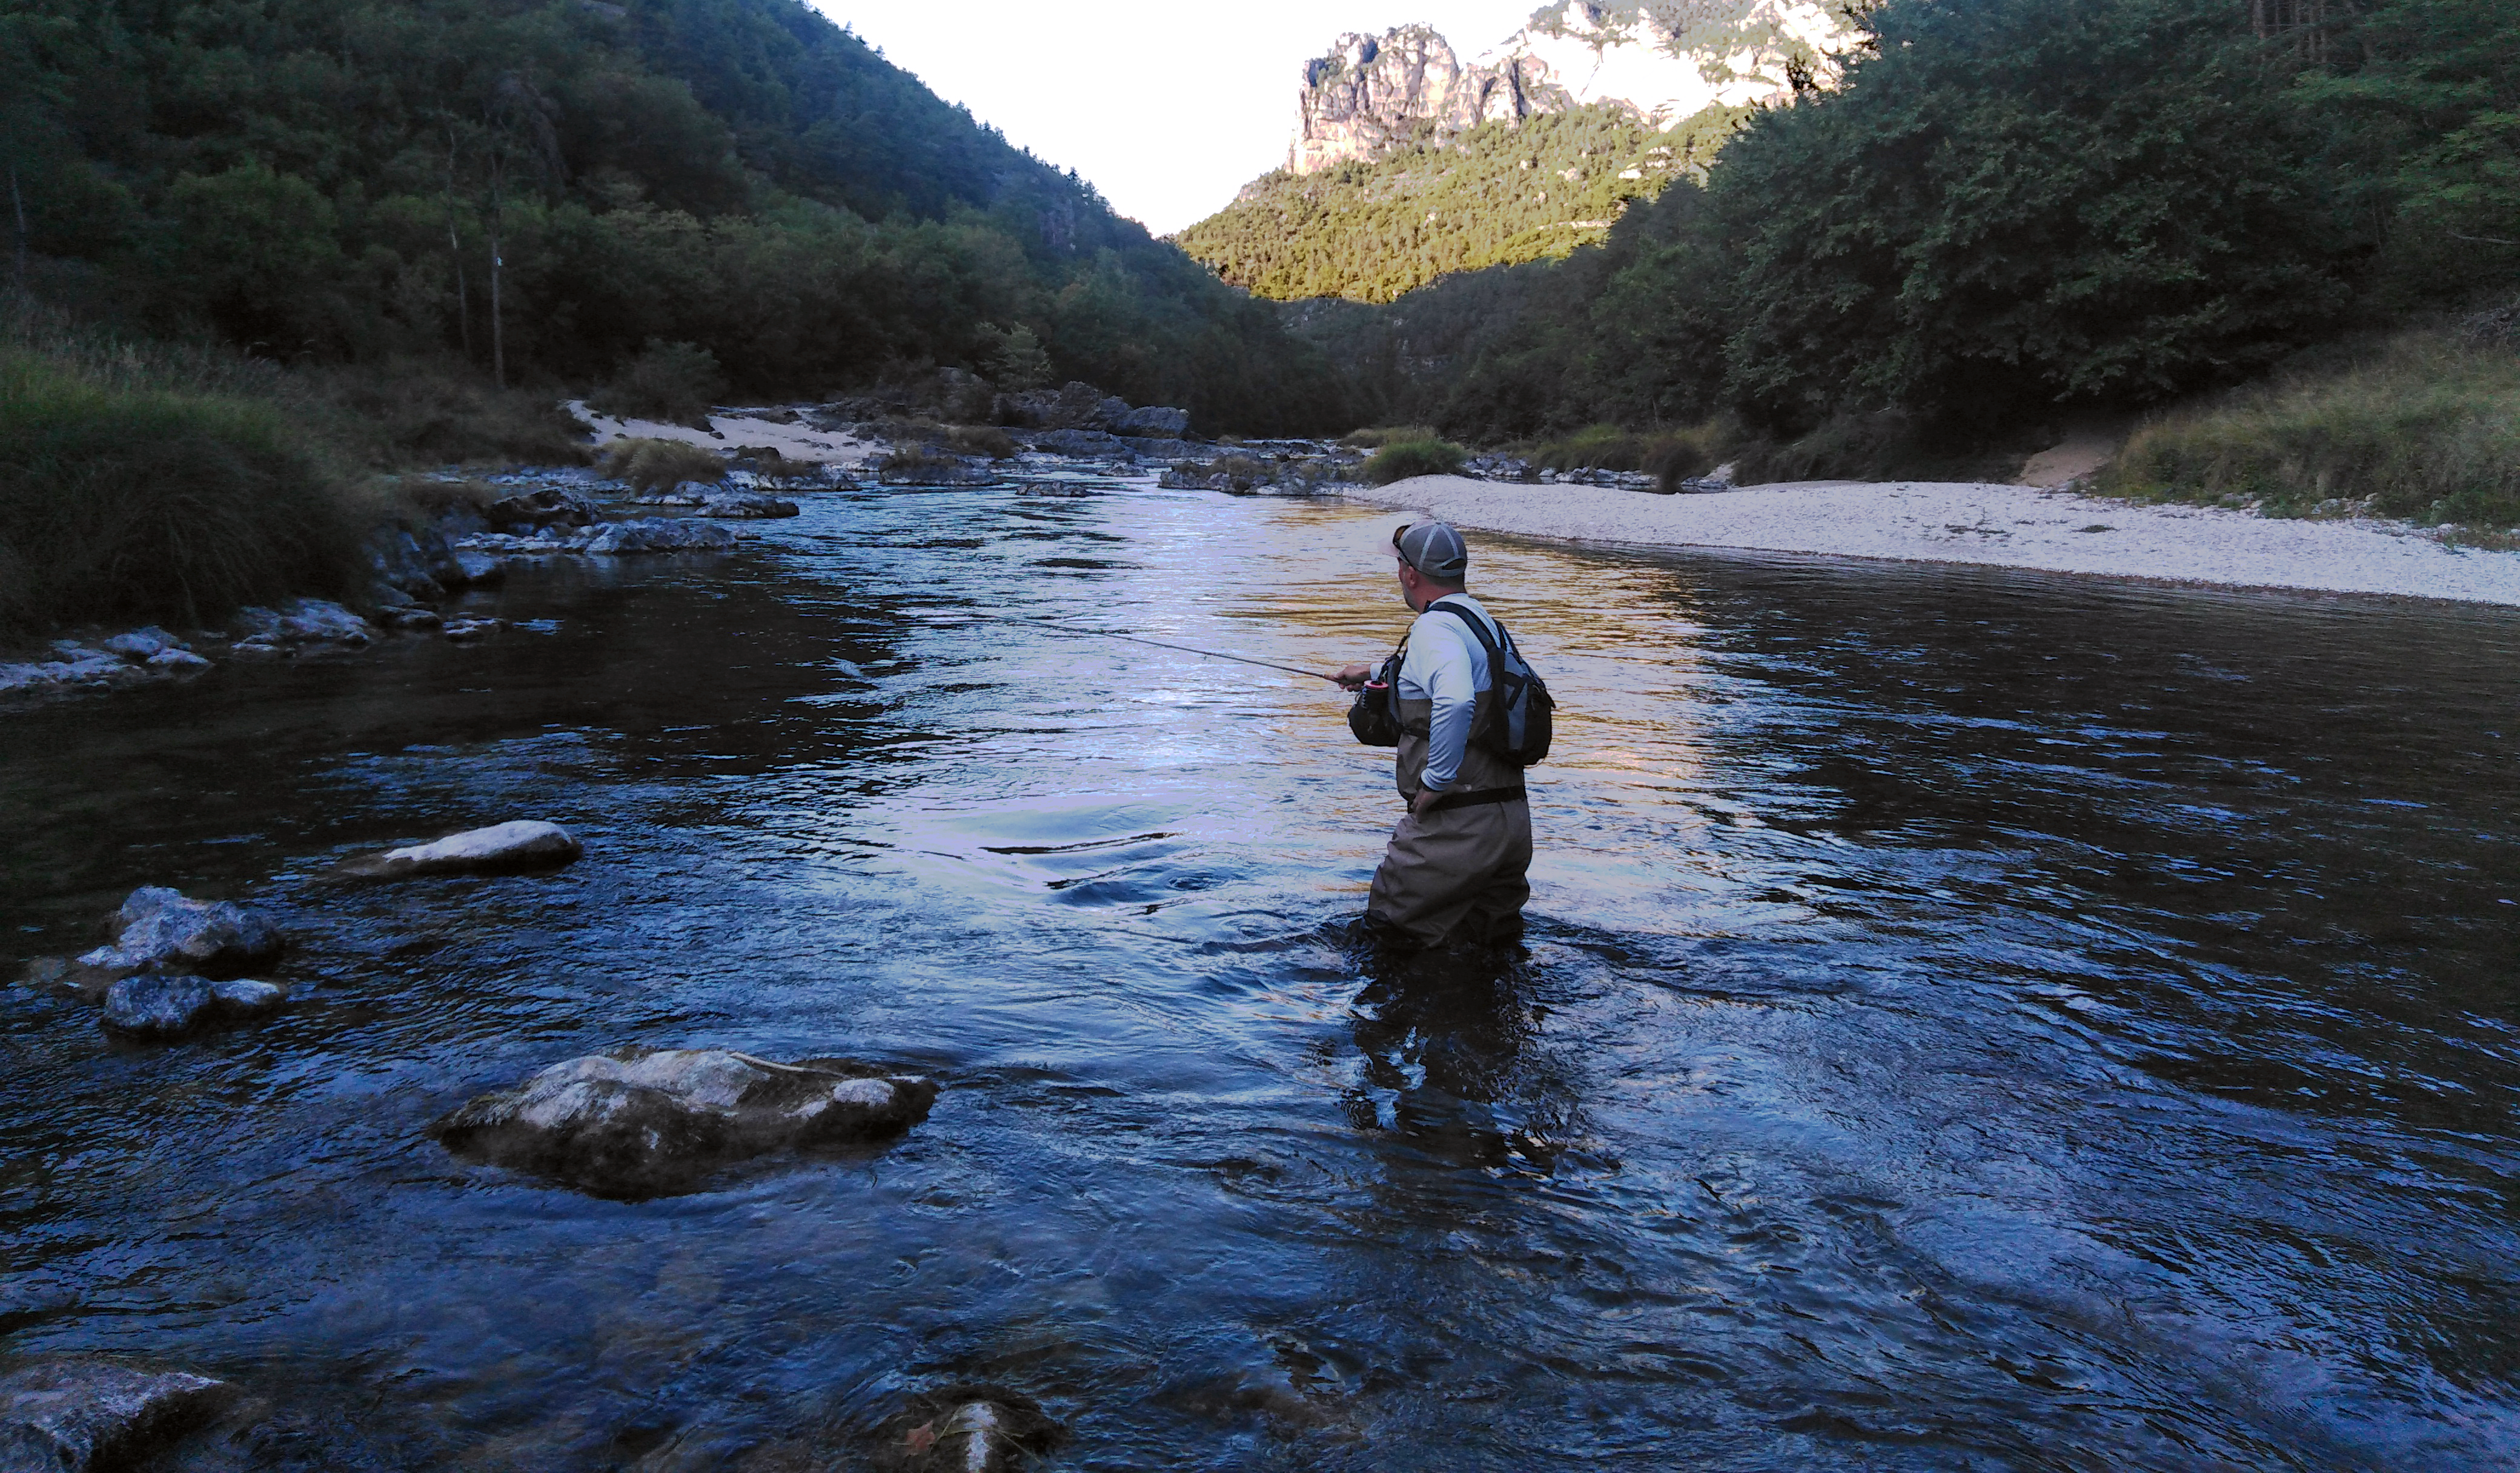 Truite tarn, guide de pêche à la mouche Aveyron, pêche à la mouche, tenkara, nymphe,